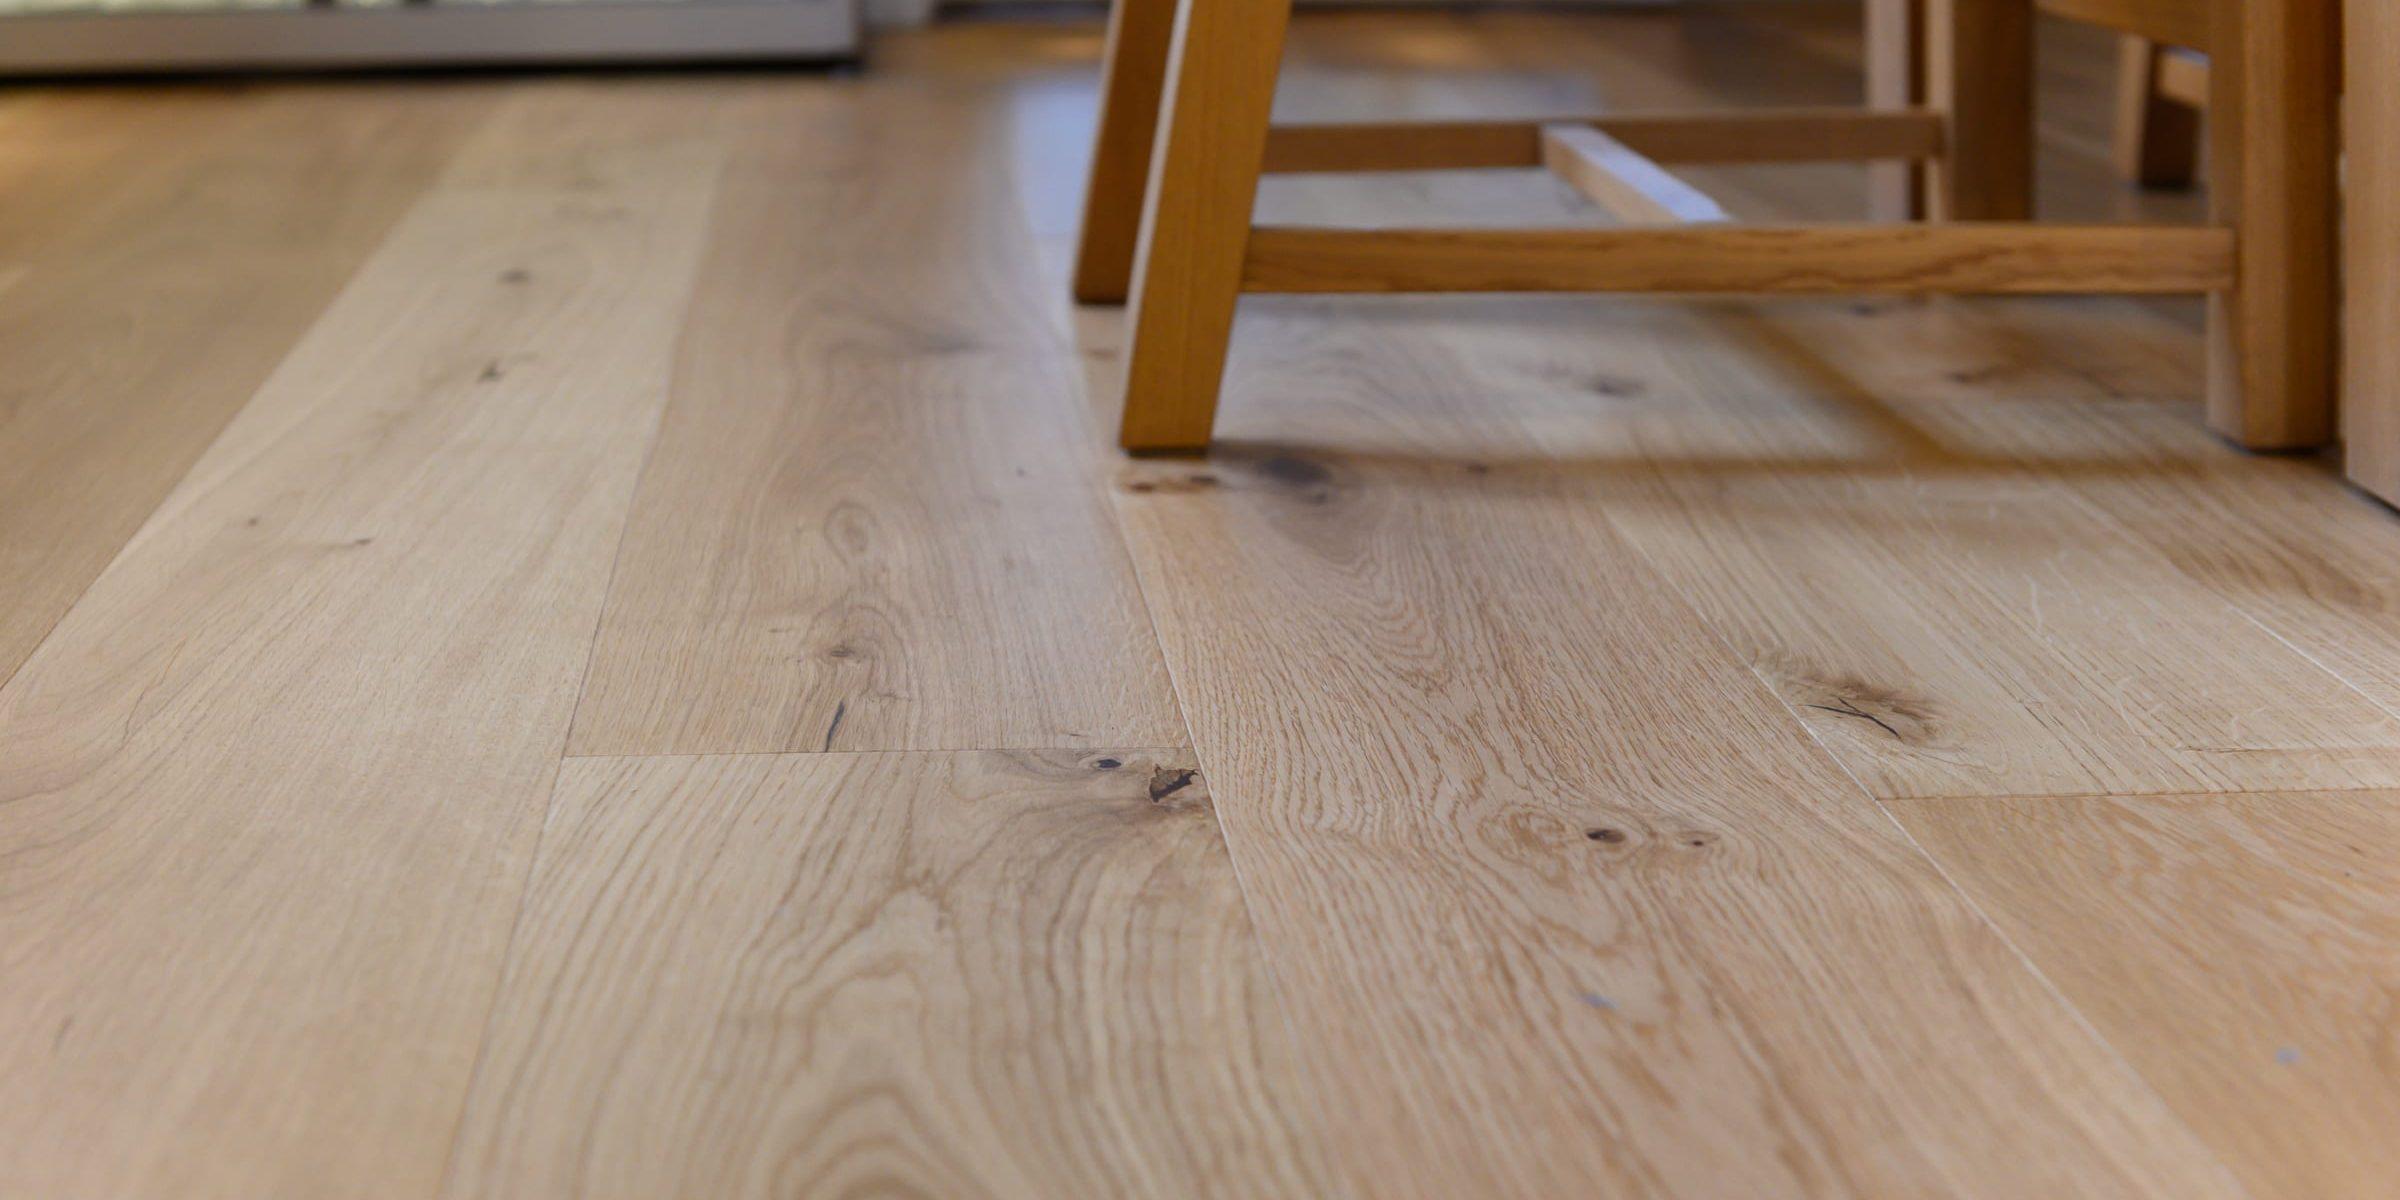 close up of Eiger Matt Lacquered wood floors